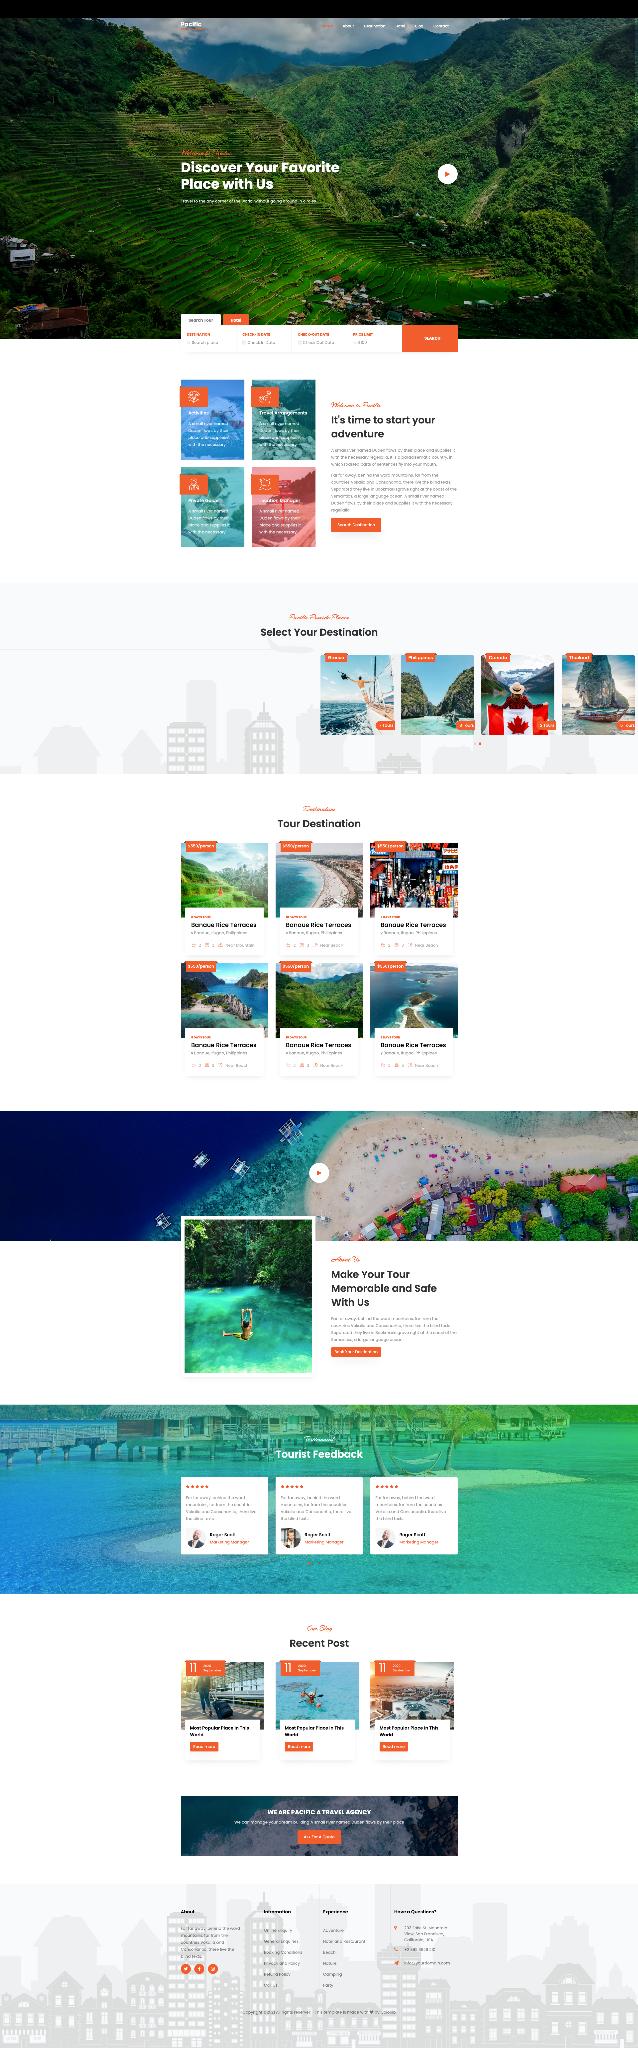 Mẫu website du lịch 2